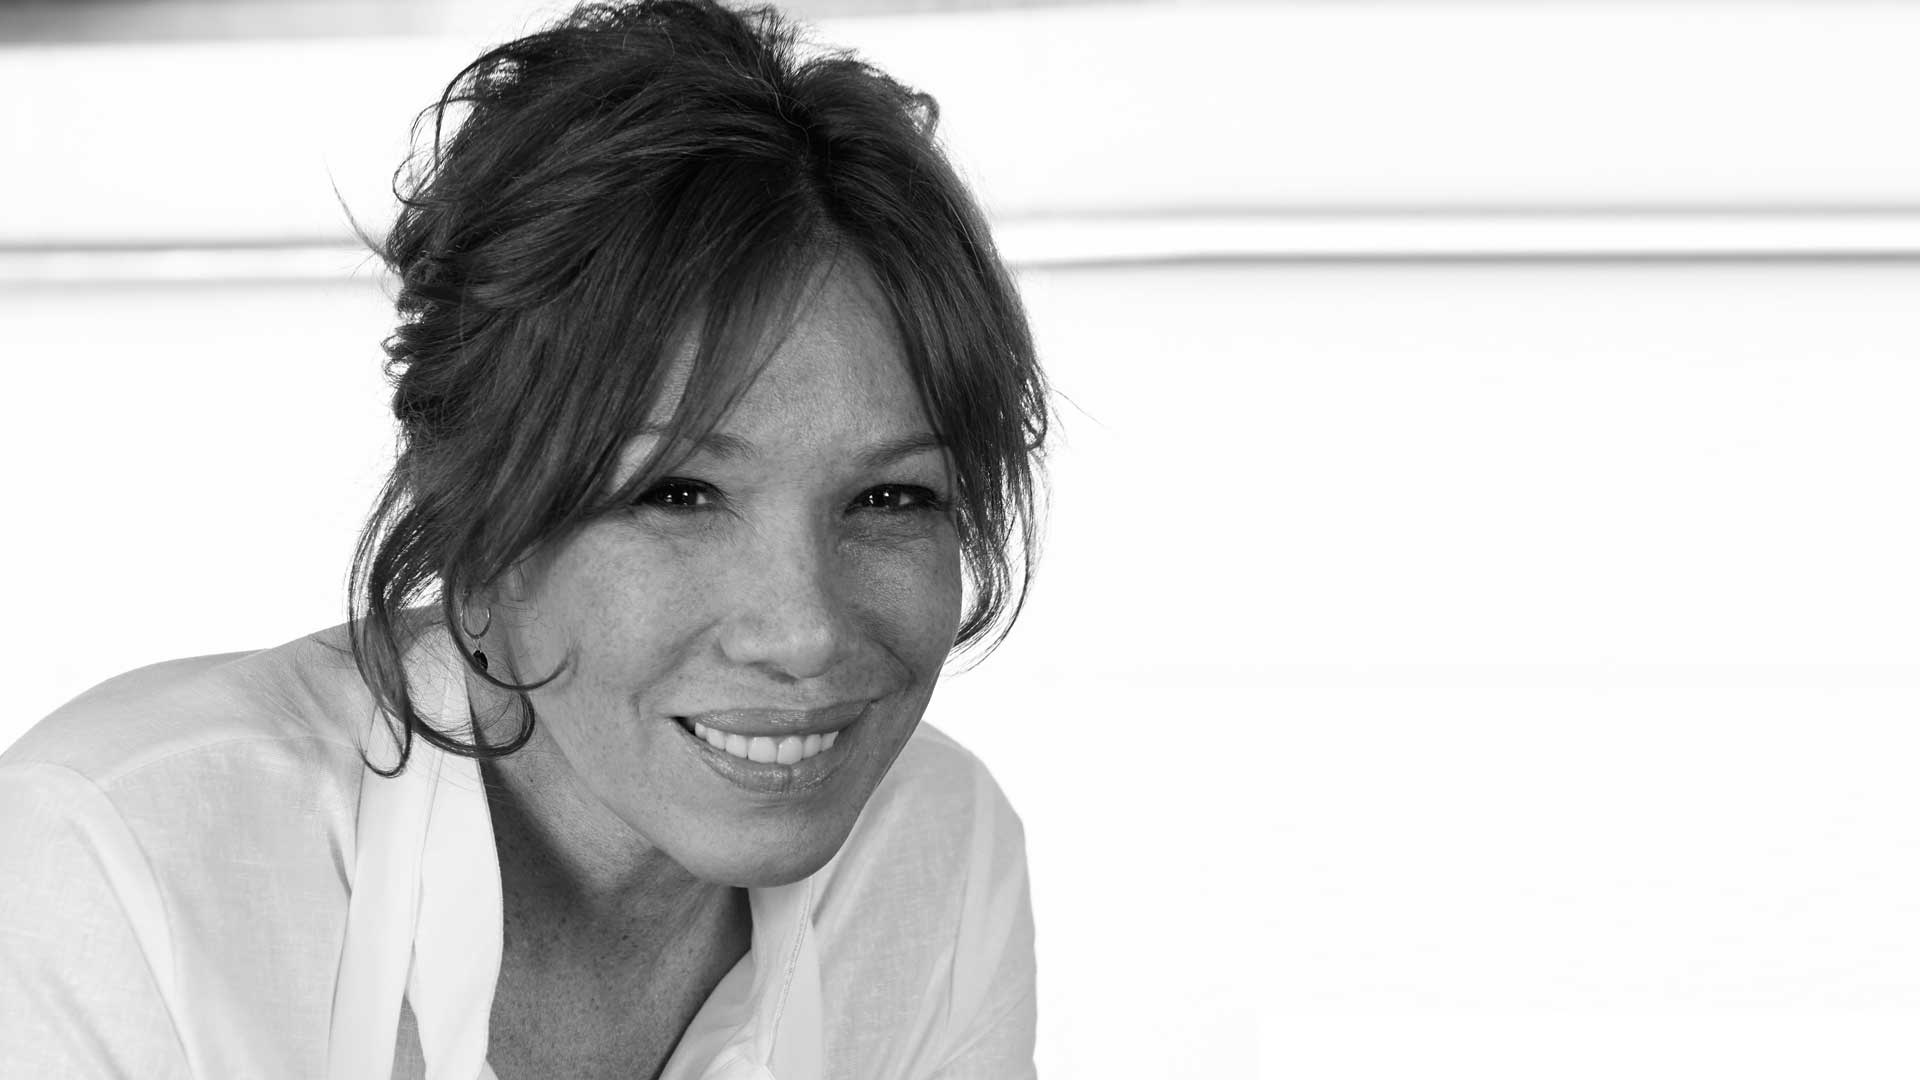 Chef Leonor Espinosa se lleva el premio estrella Damm Chefs' Choice Award